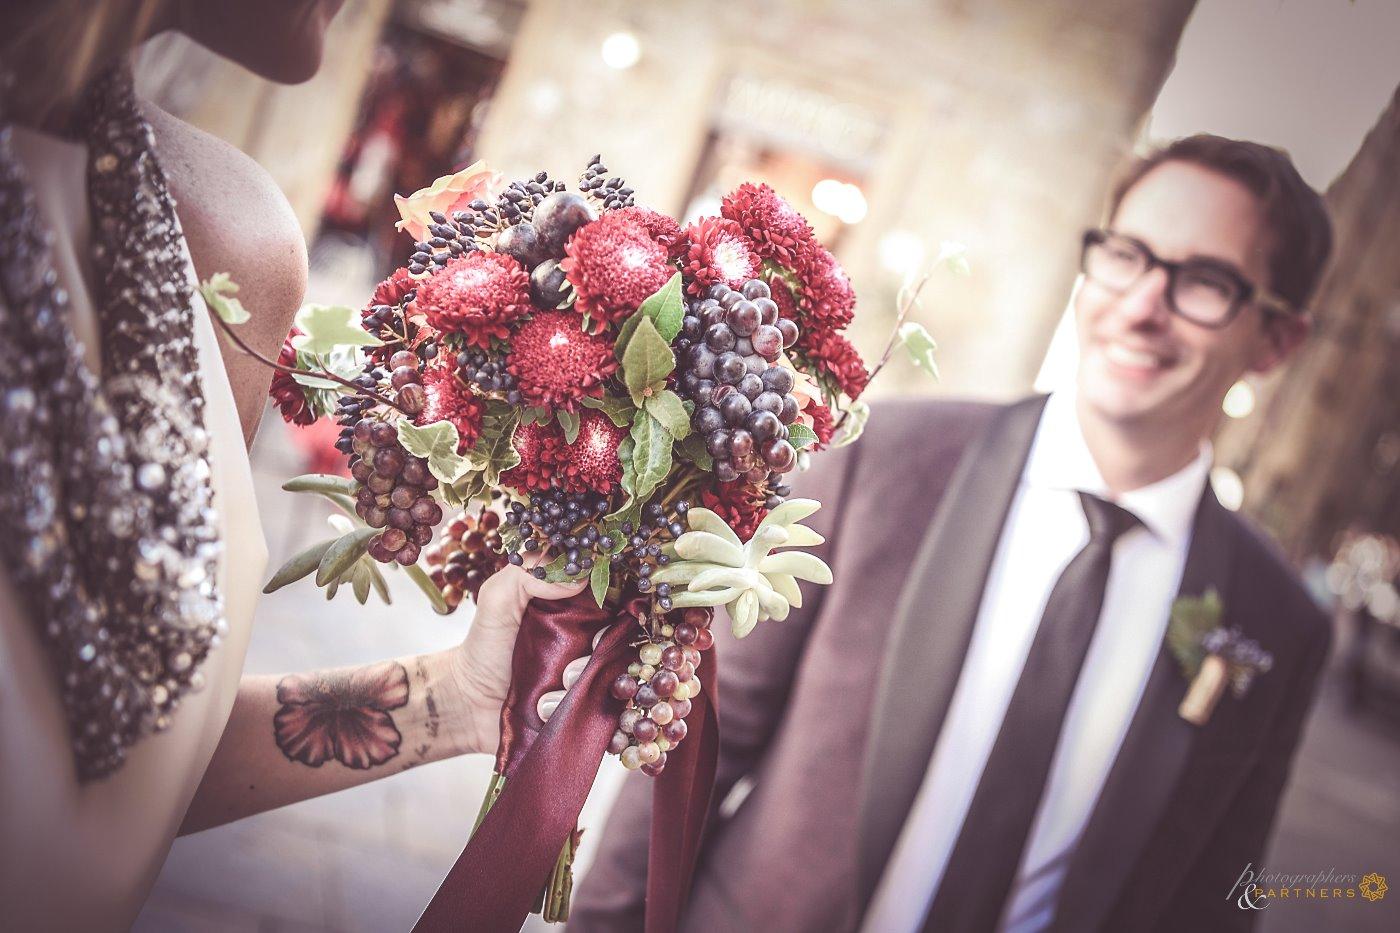 photography_marriage_volterra_11.jpg